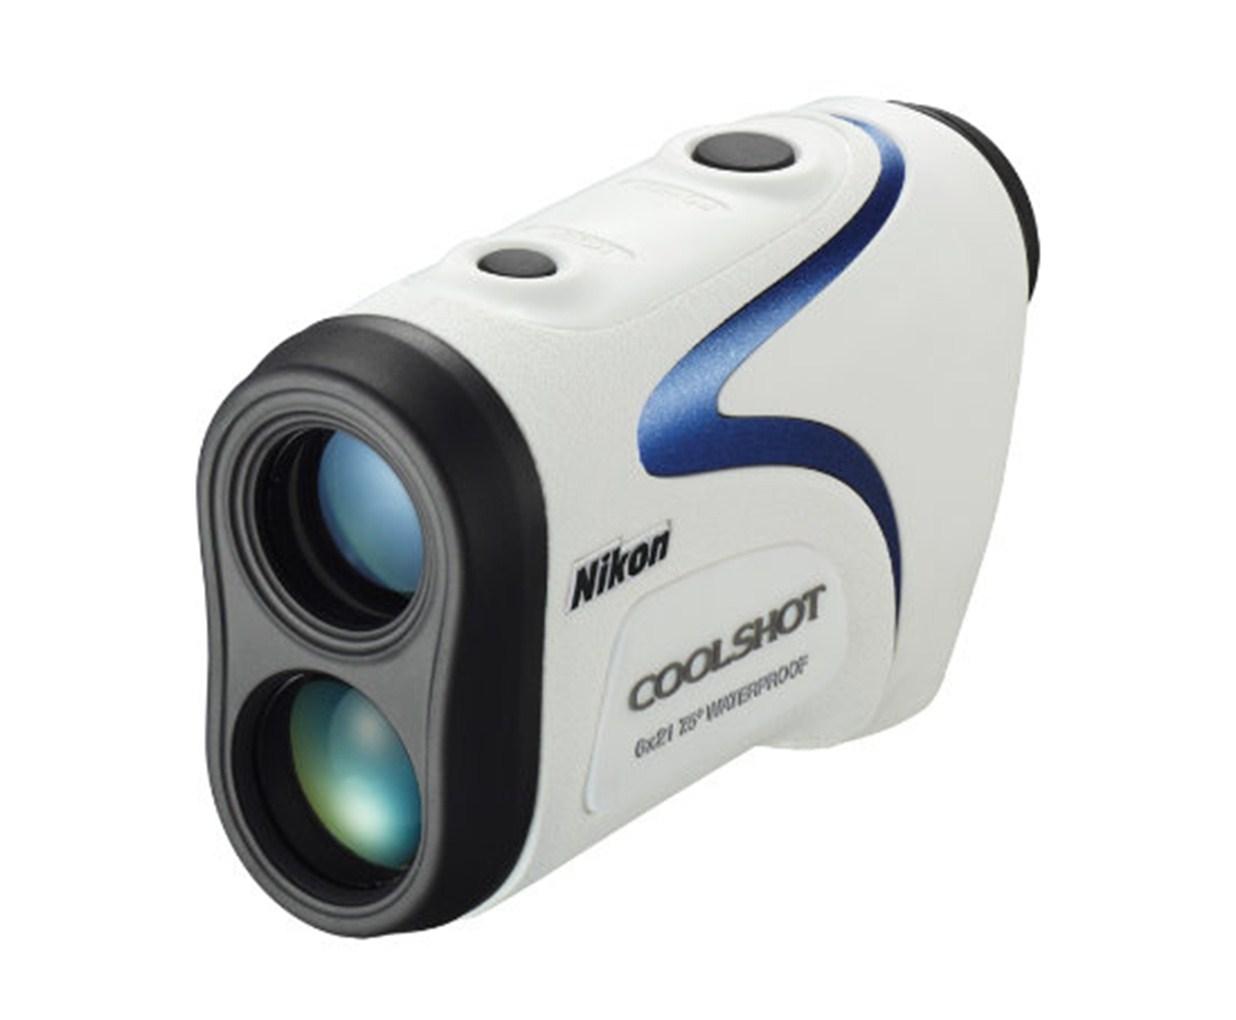 Nikon Coolshot Laser Rangefinder 8392